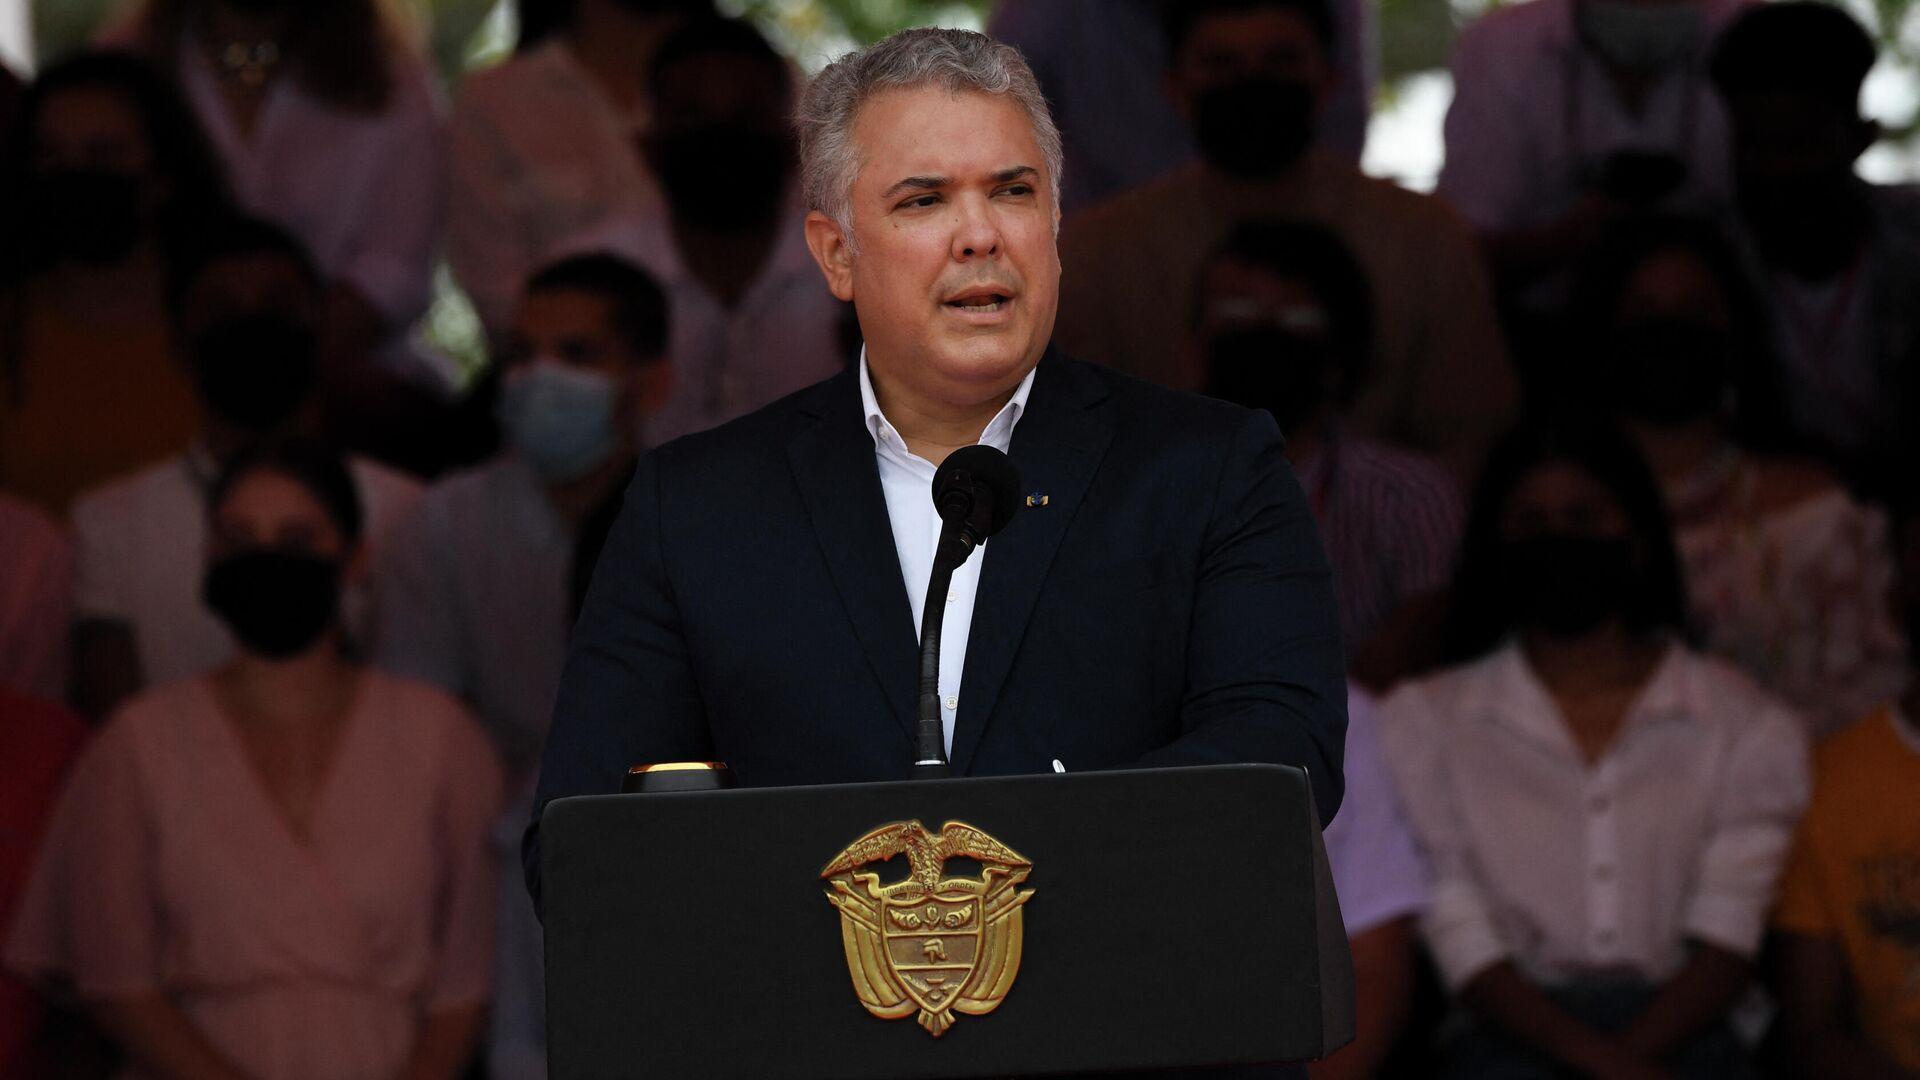 El presidente de Colombia, Iván Duque - Sputnik Mundo, 1920, 07.10.2021